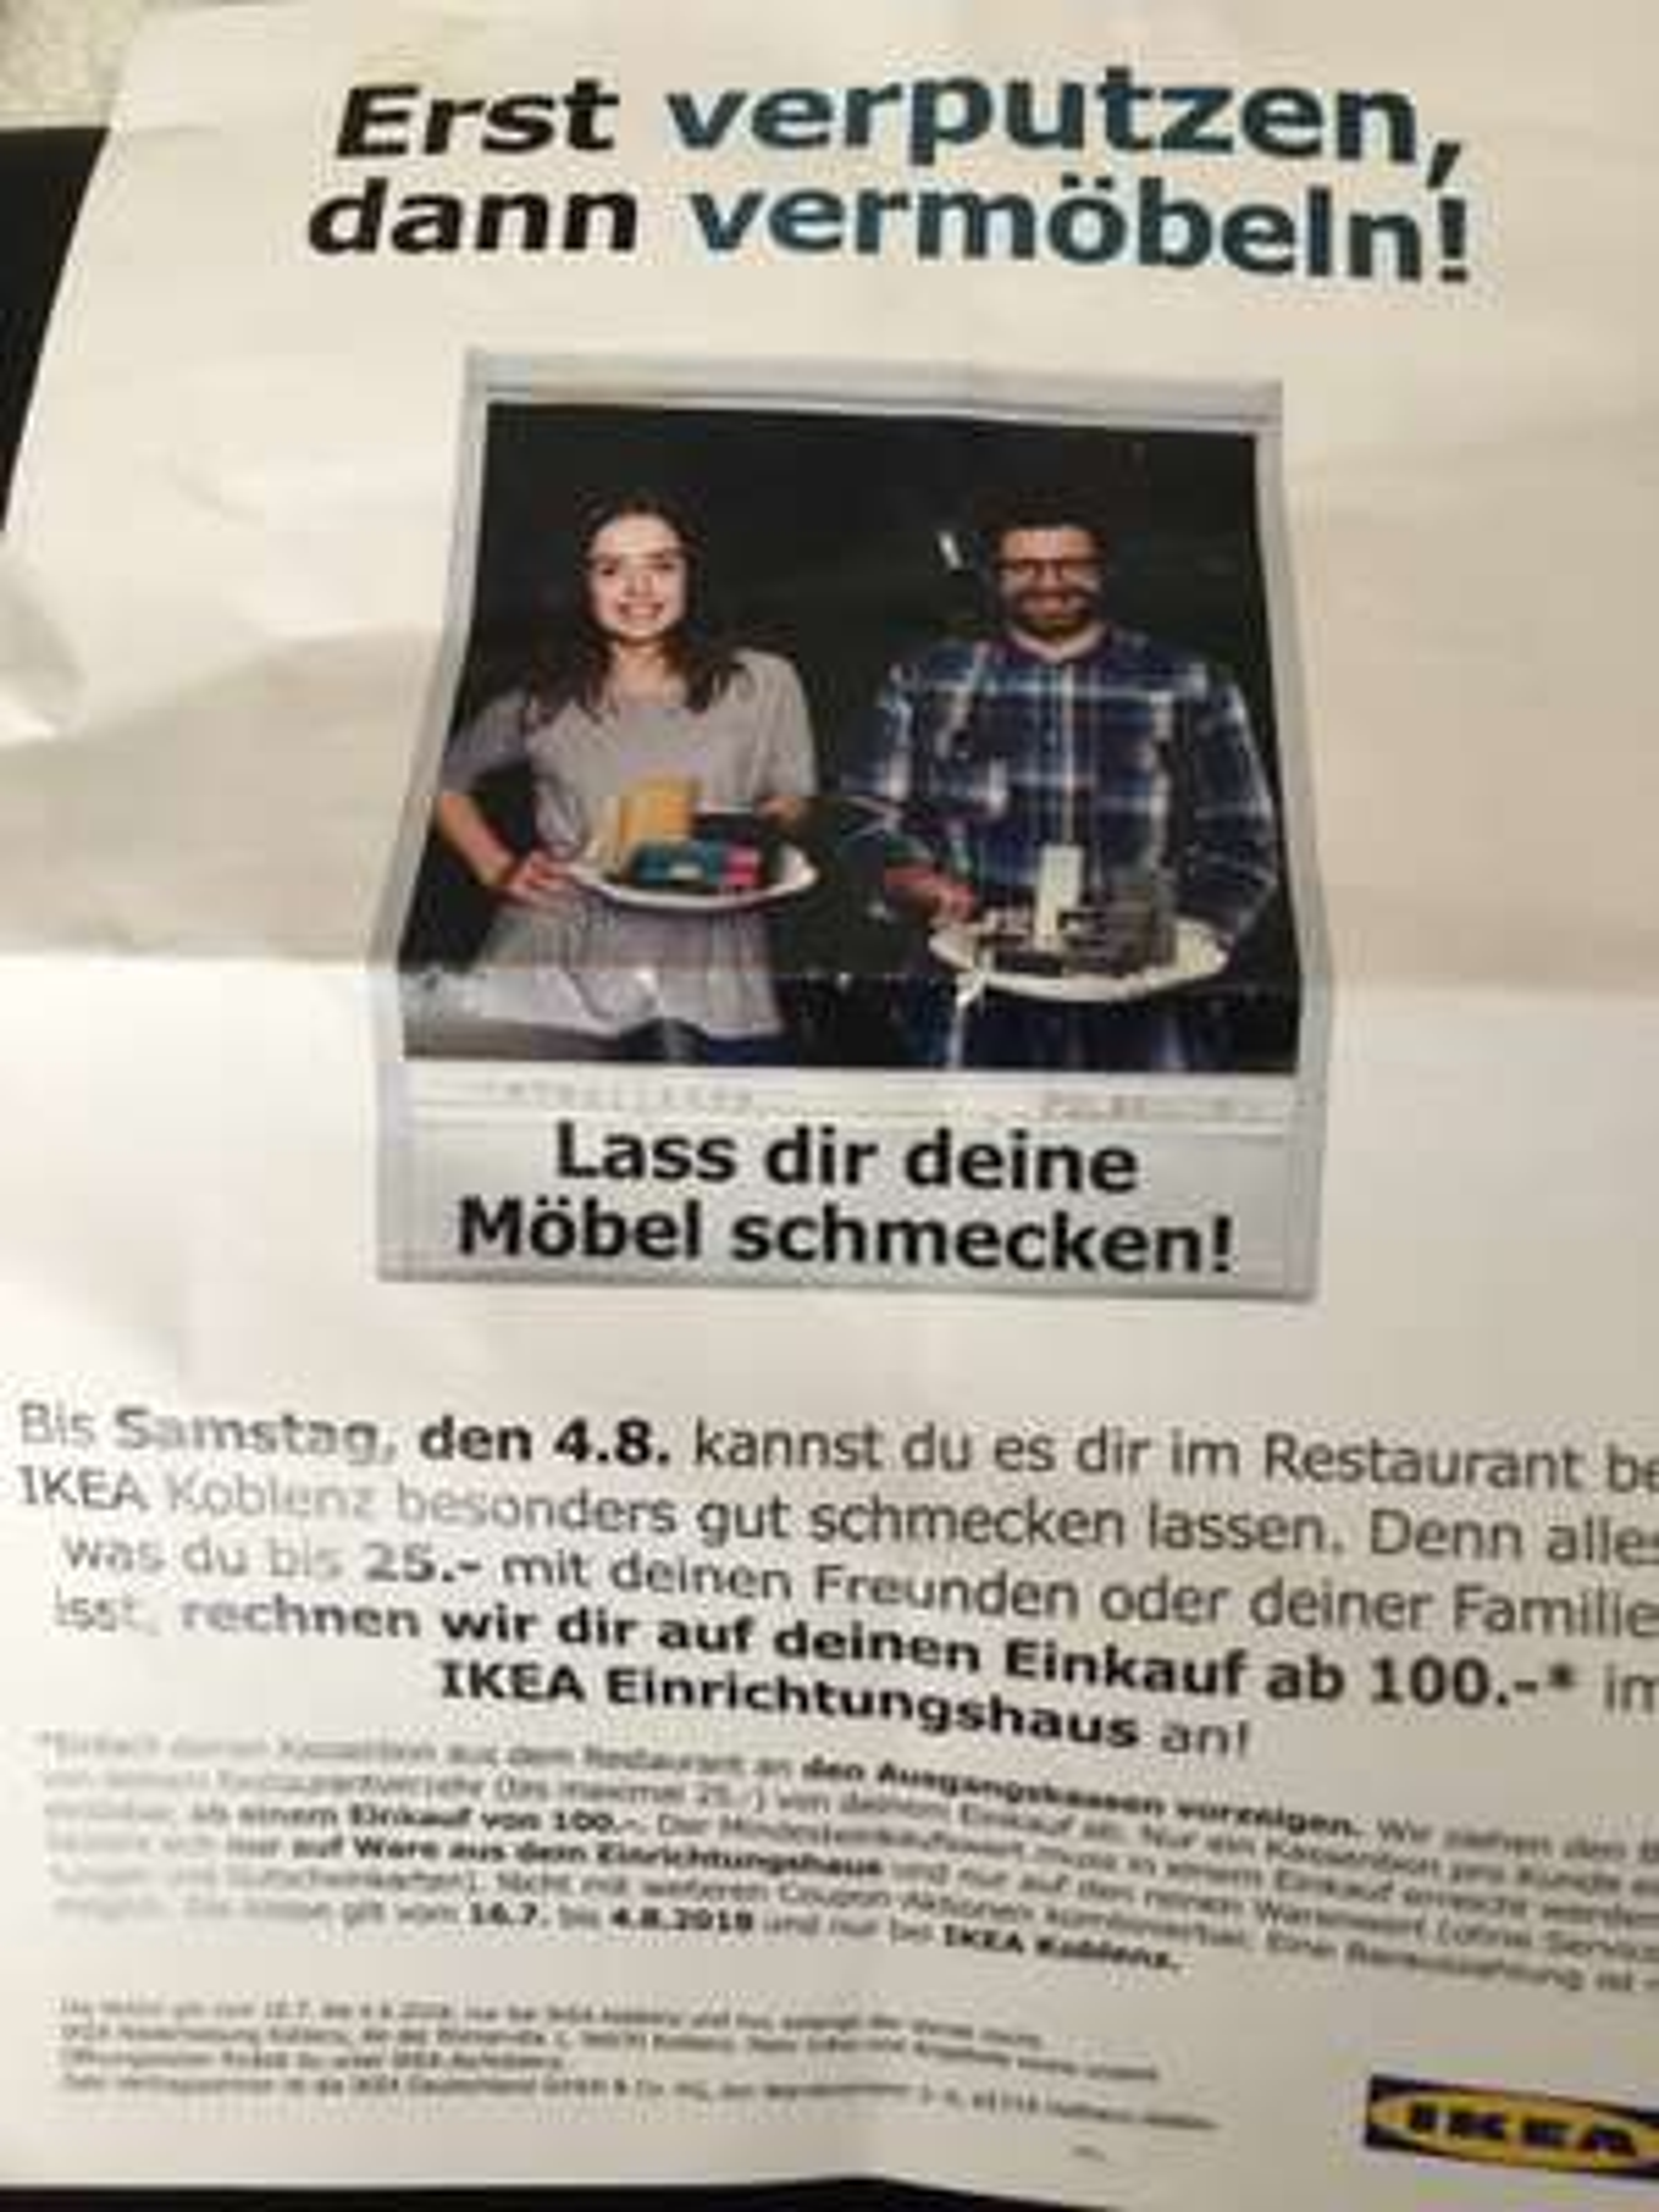 Ikea Koblenz: Lass dir deine Möbel schmecken